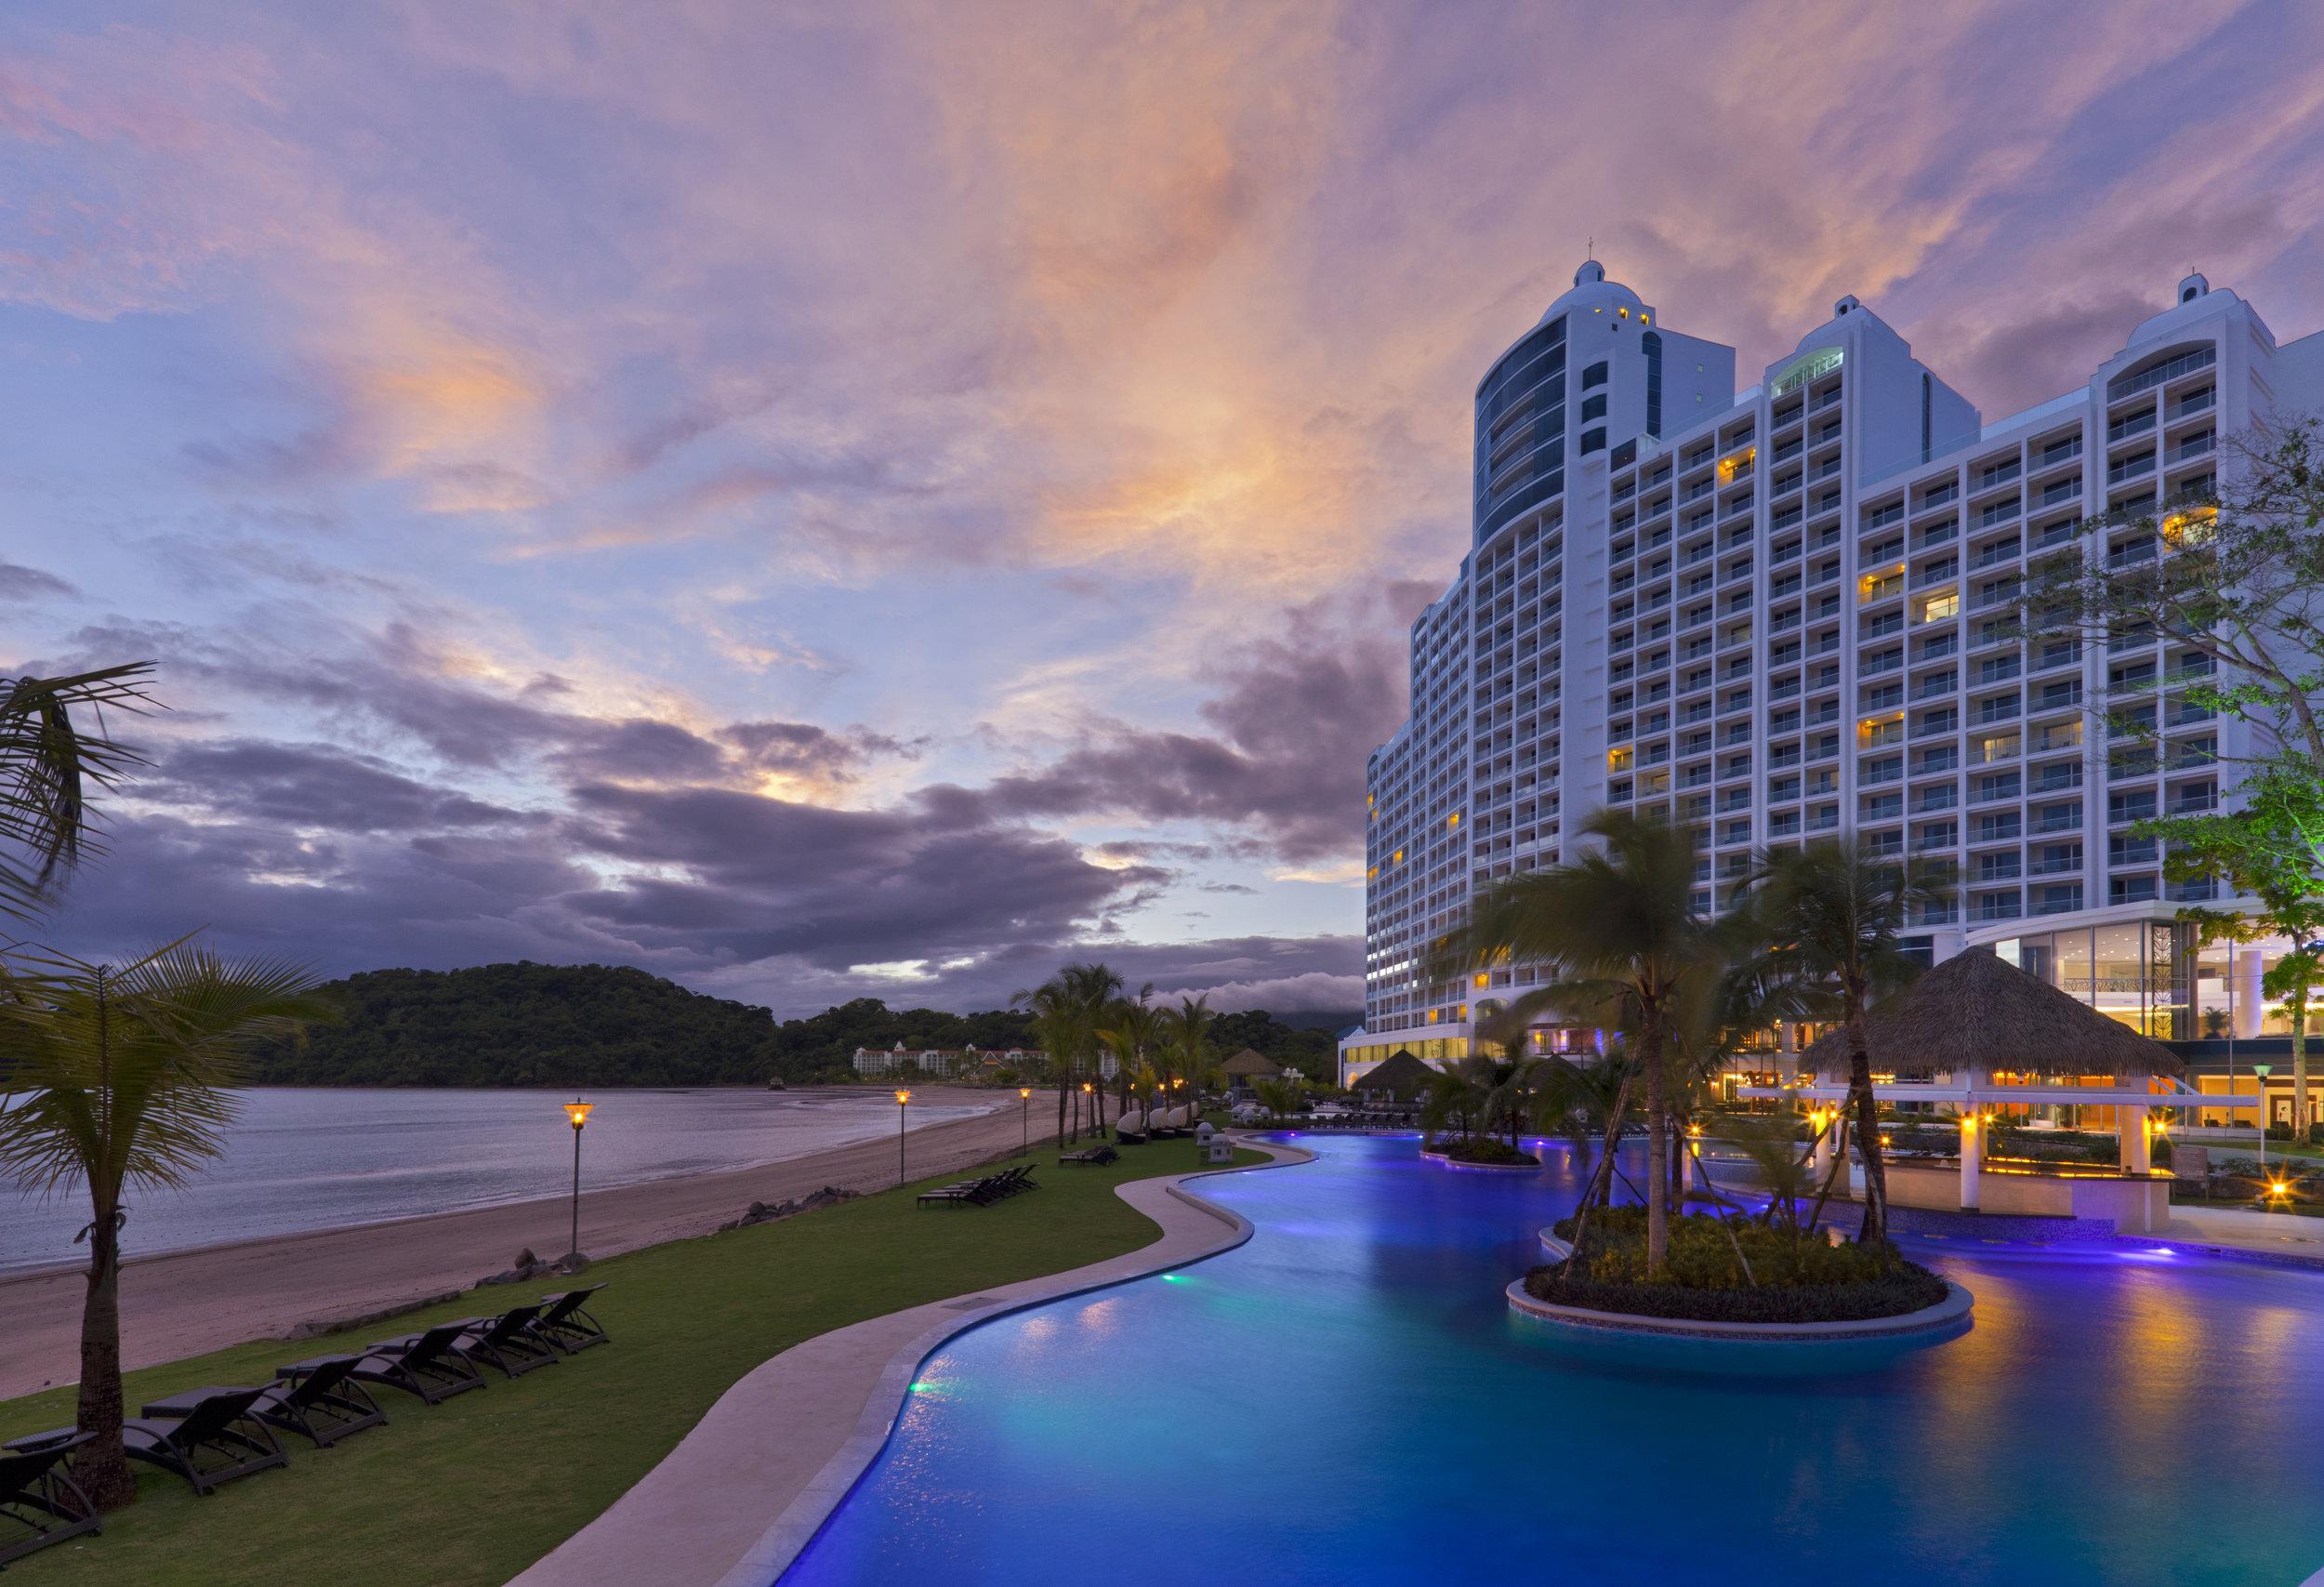 Westin Playa Bonita Great Black Friday Deals on Hotels